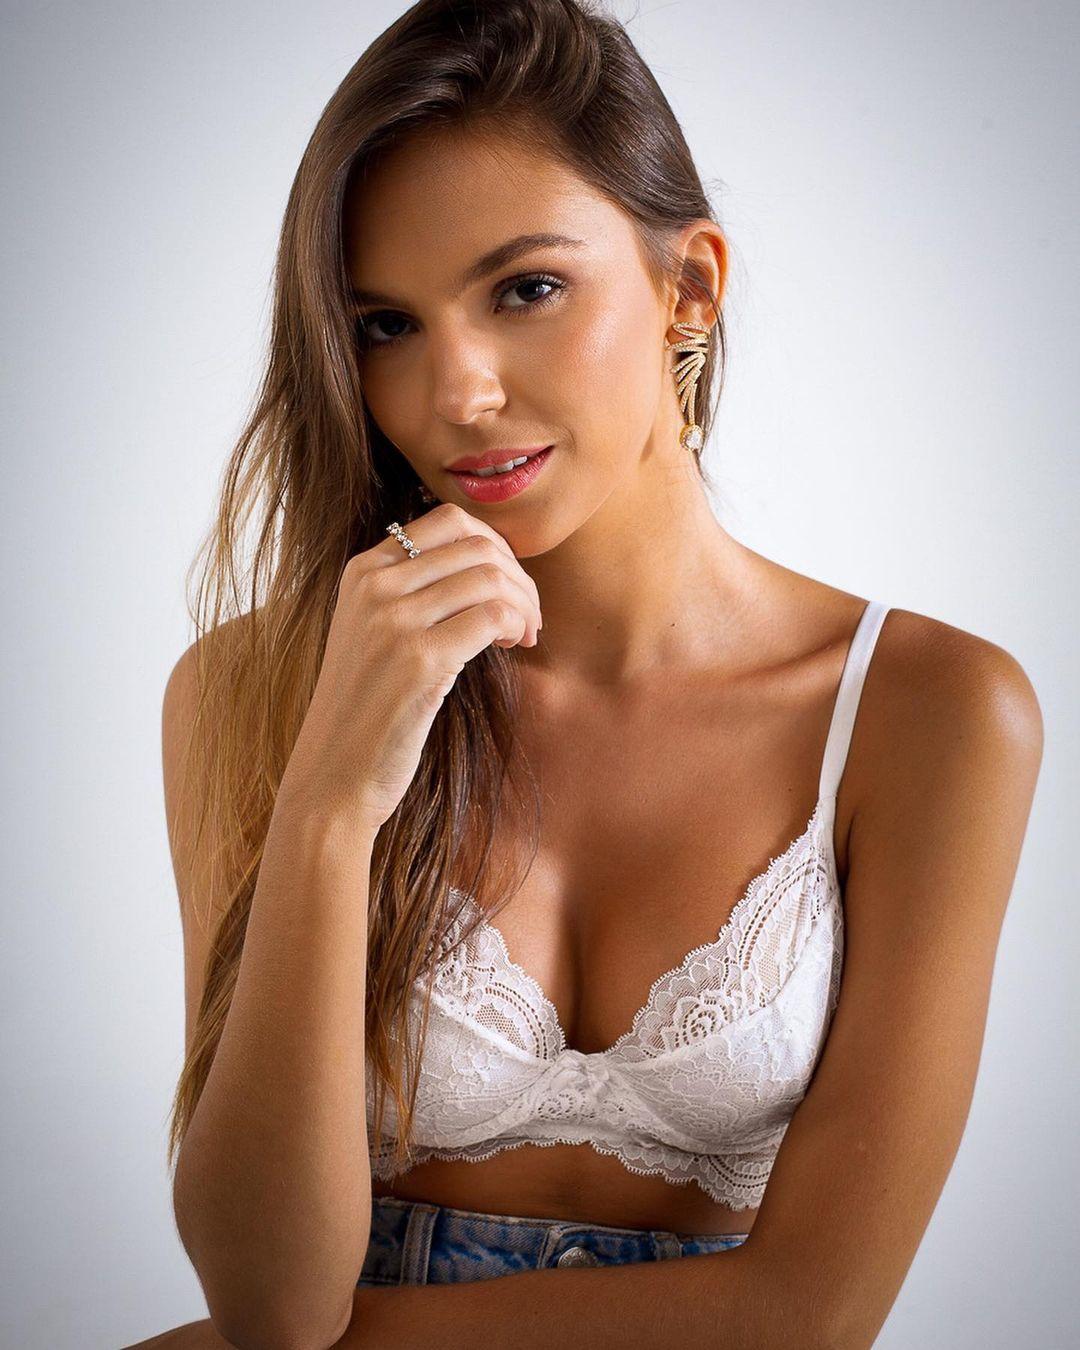 ana flavia giacomini, miss ilha dos lobos mundo 2019. - Página 5 Fwwt6g10